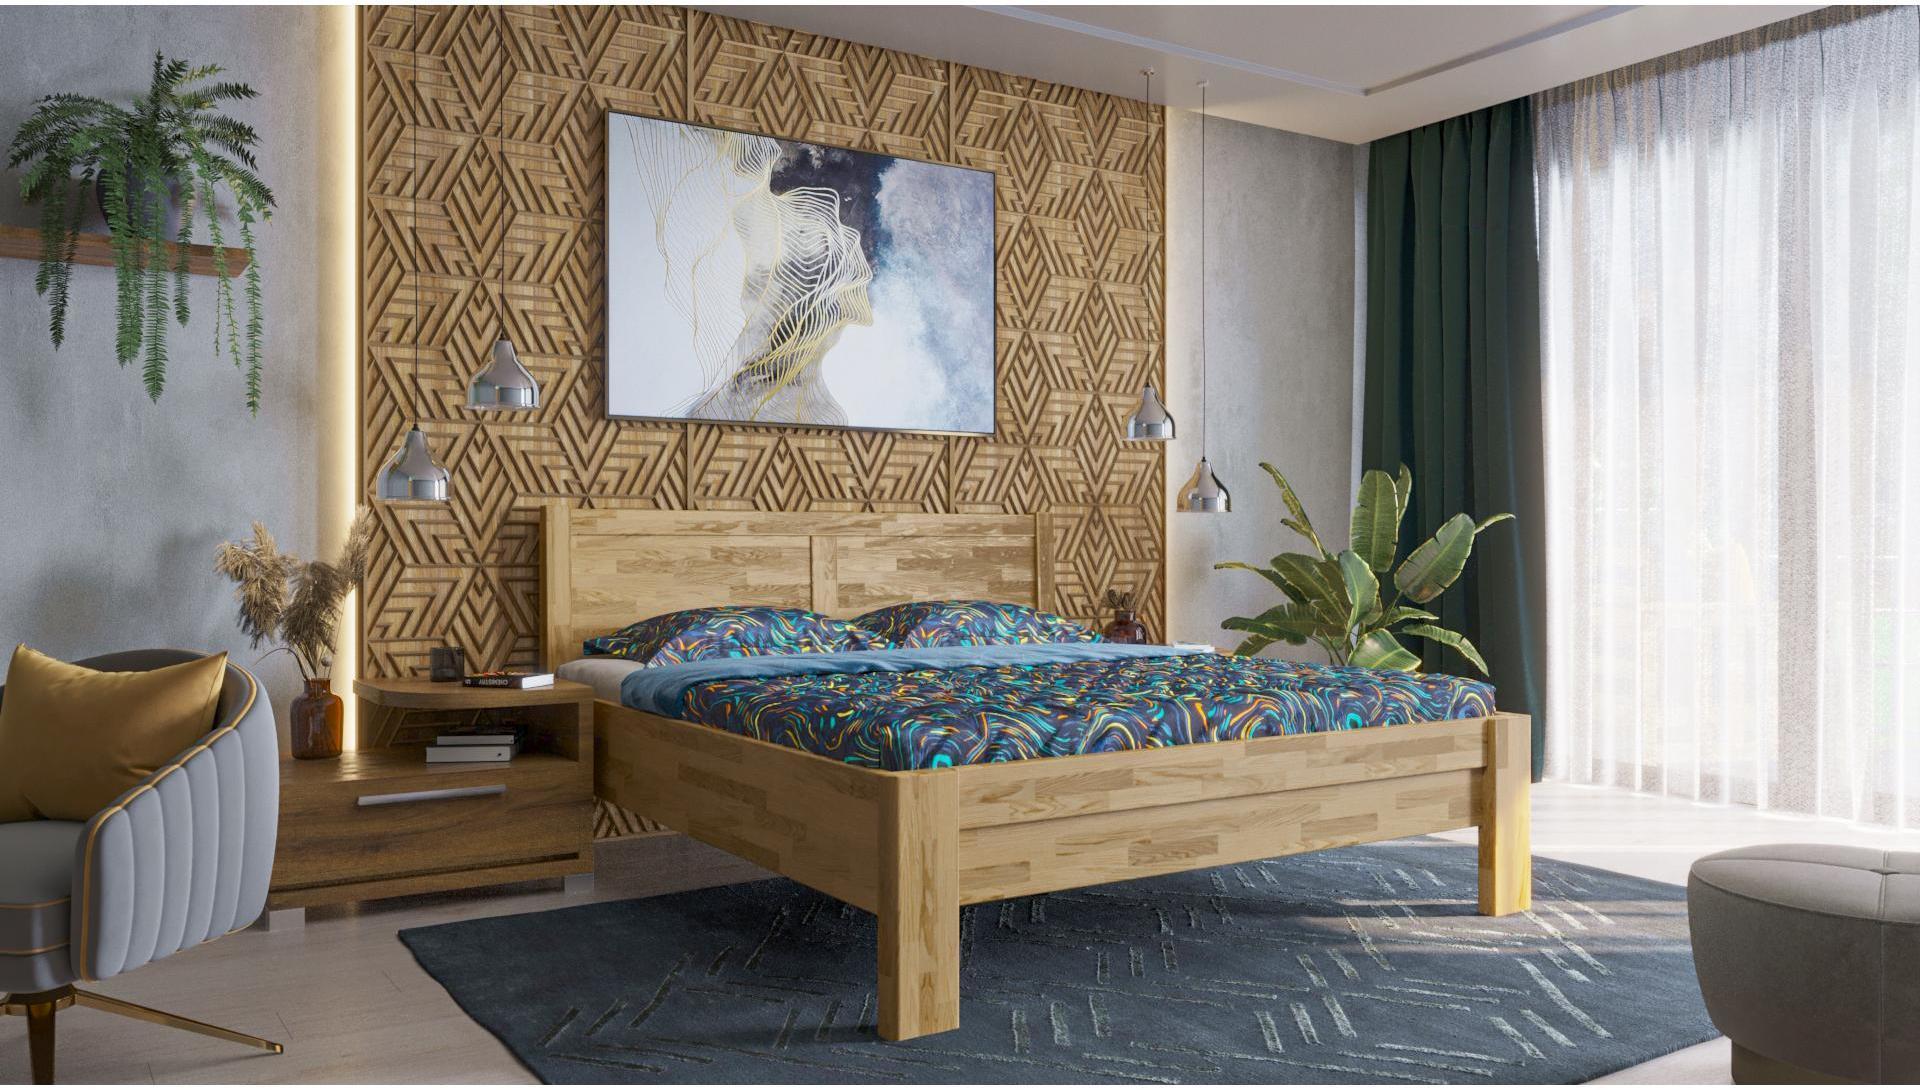 Celomasívna posteľ Celin H3 180x200 cm dub D1